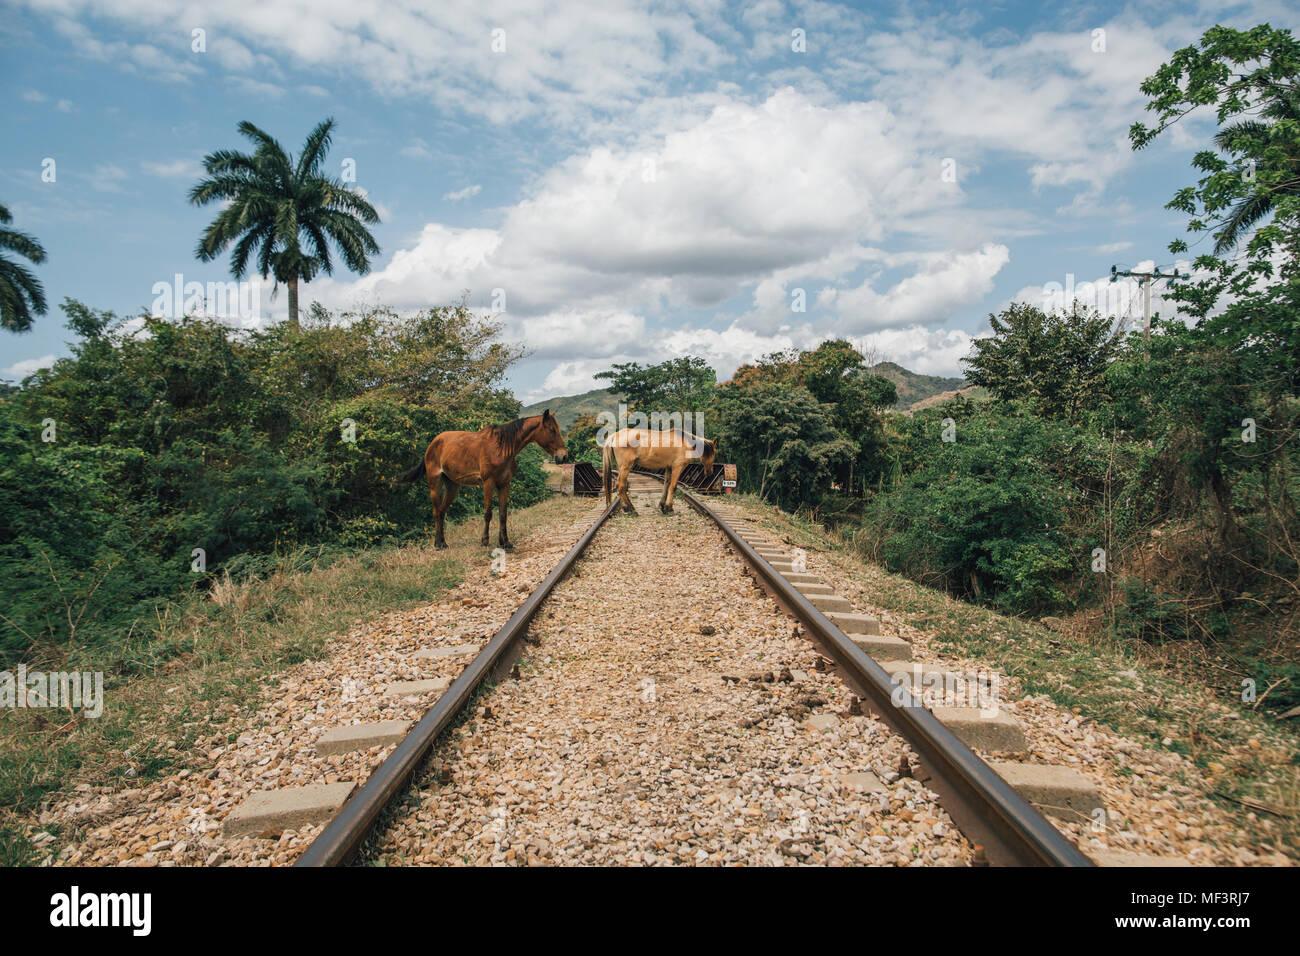 Cuba, Two horses on rail tracks - Stock Image